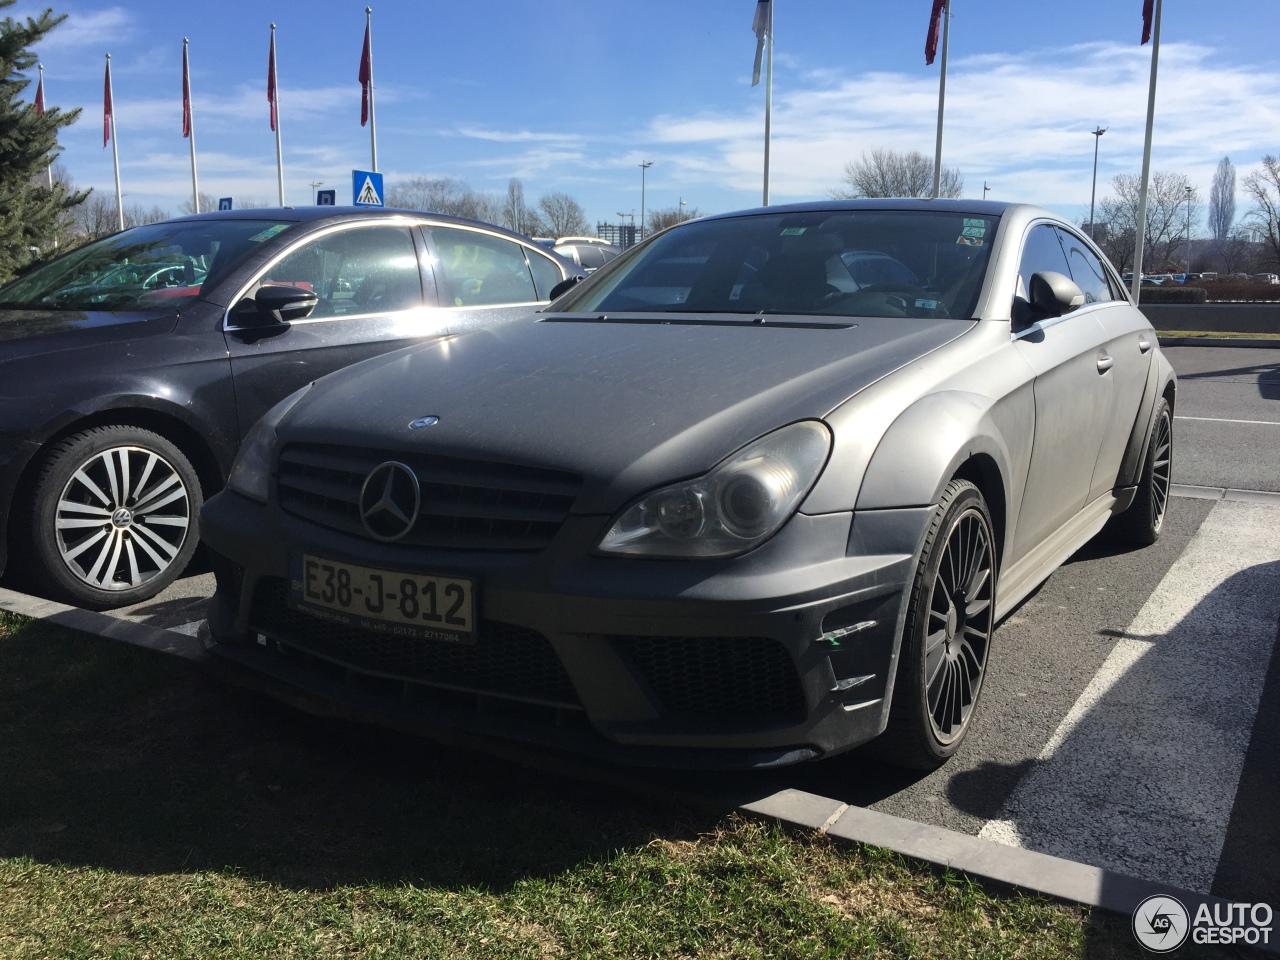 Mercedes benz cls 63 amg c219 prior design 8 march 2017 for 2017 amg cls 63 mercedes benz